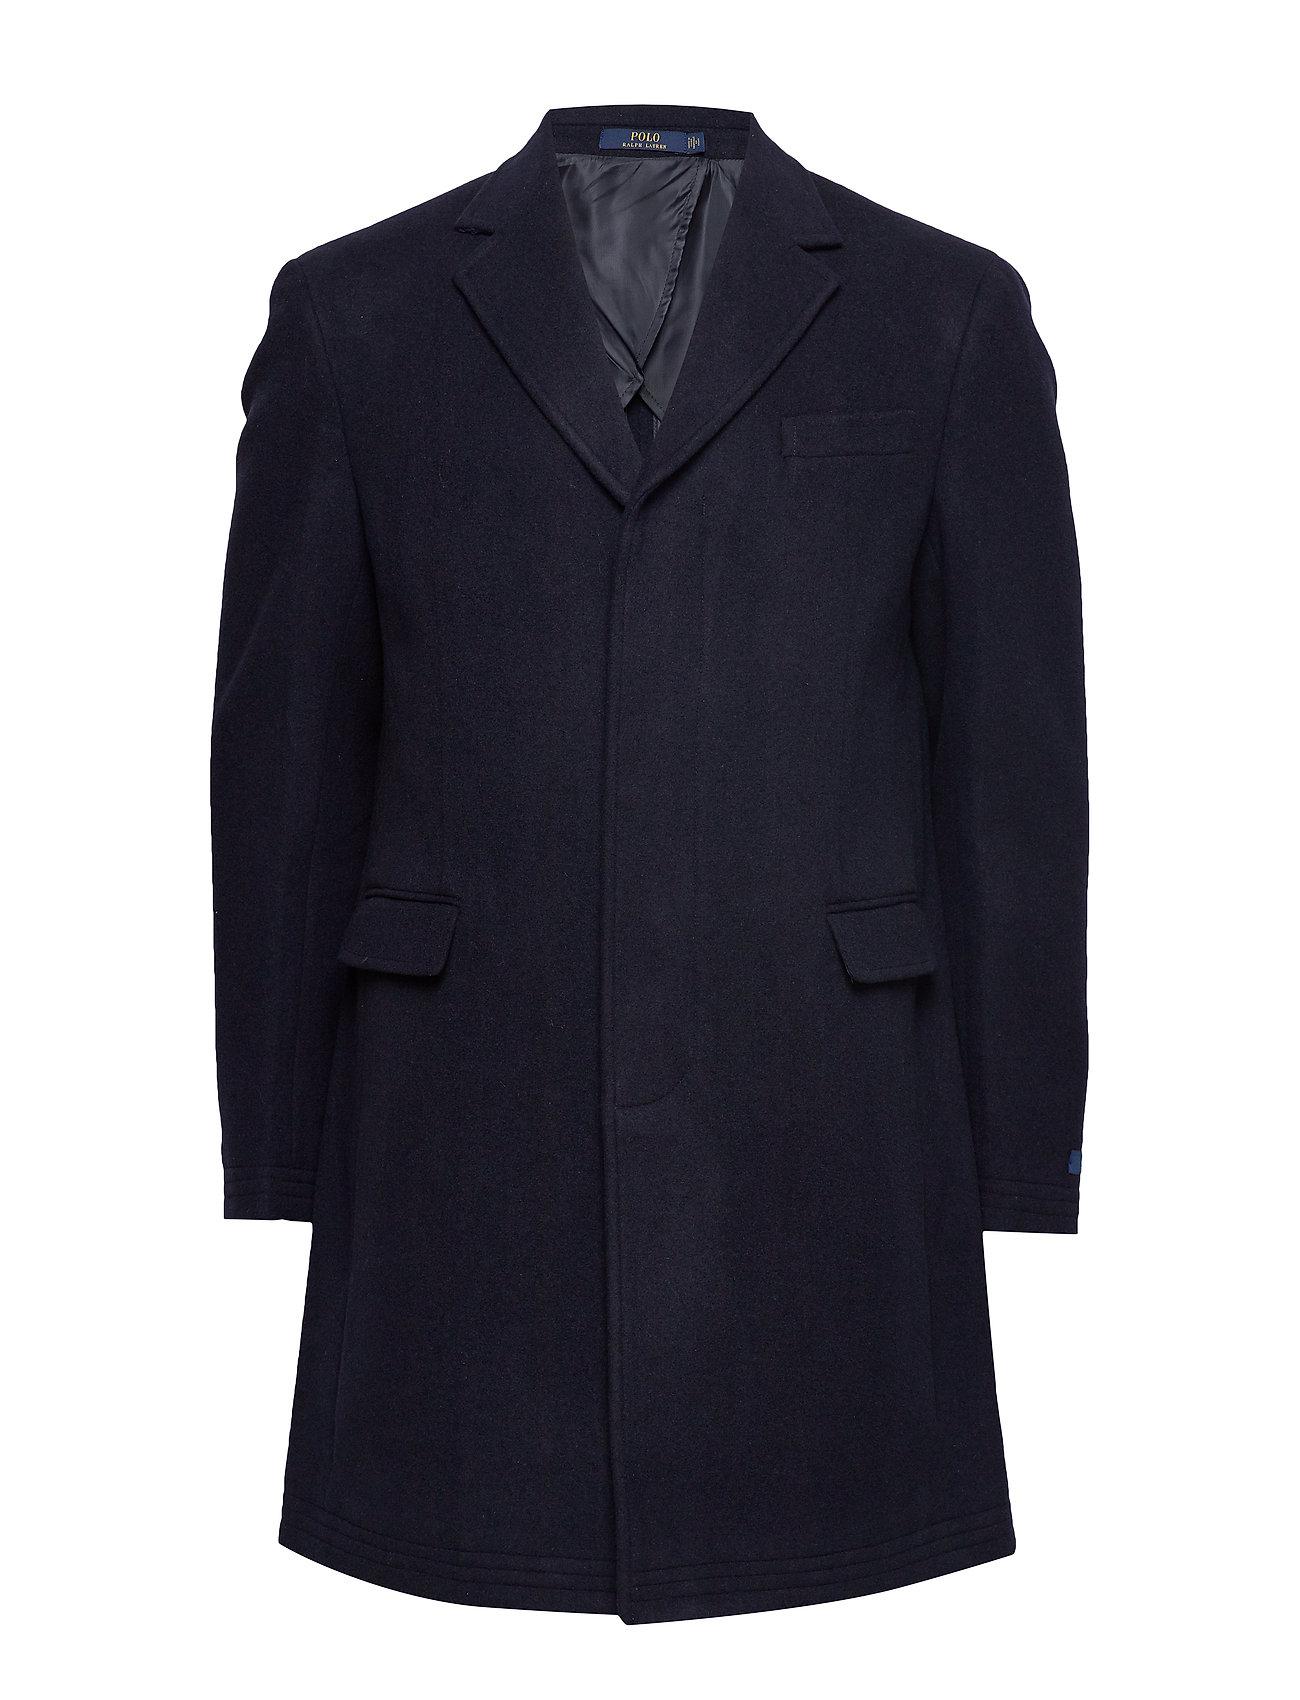 Polo Ralph Lauren Polo Unconstructed Topcoat - NAVY